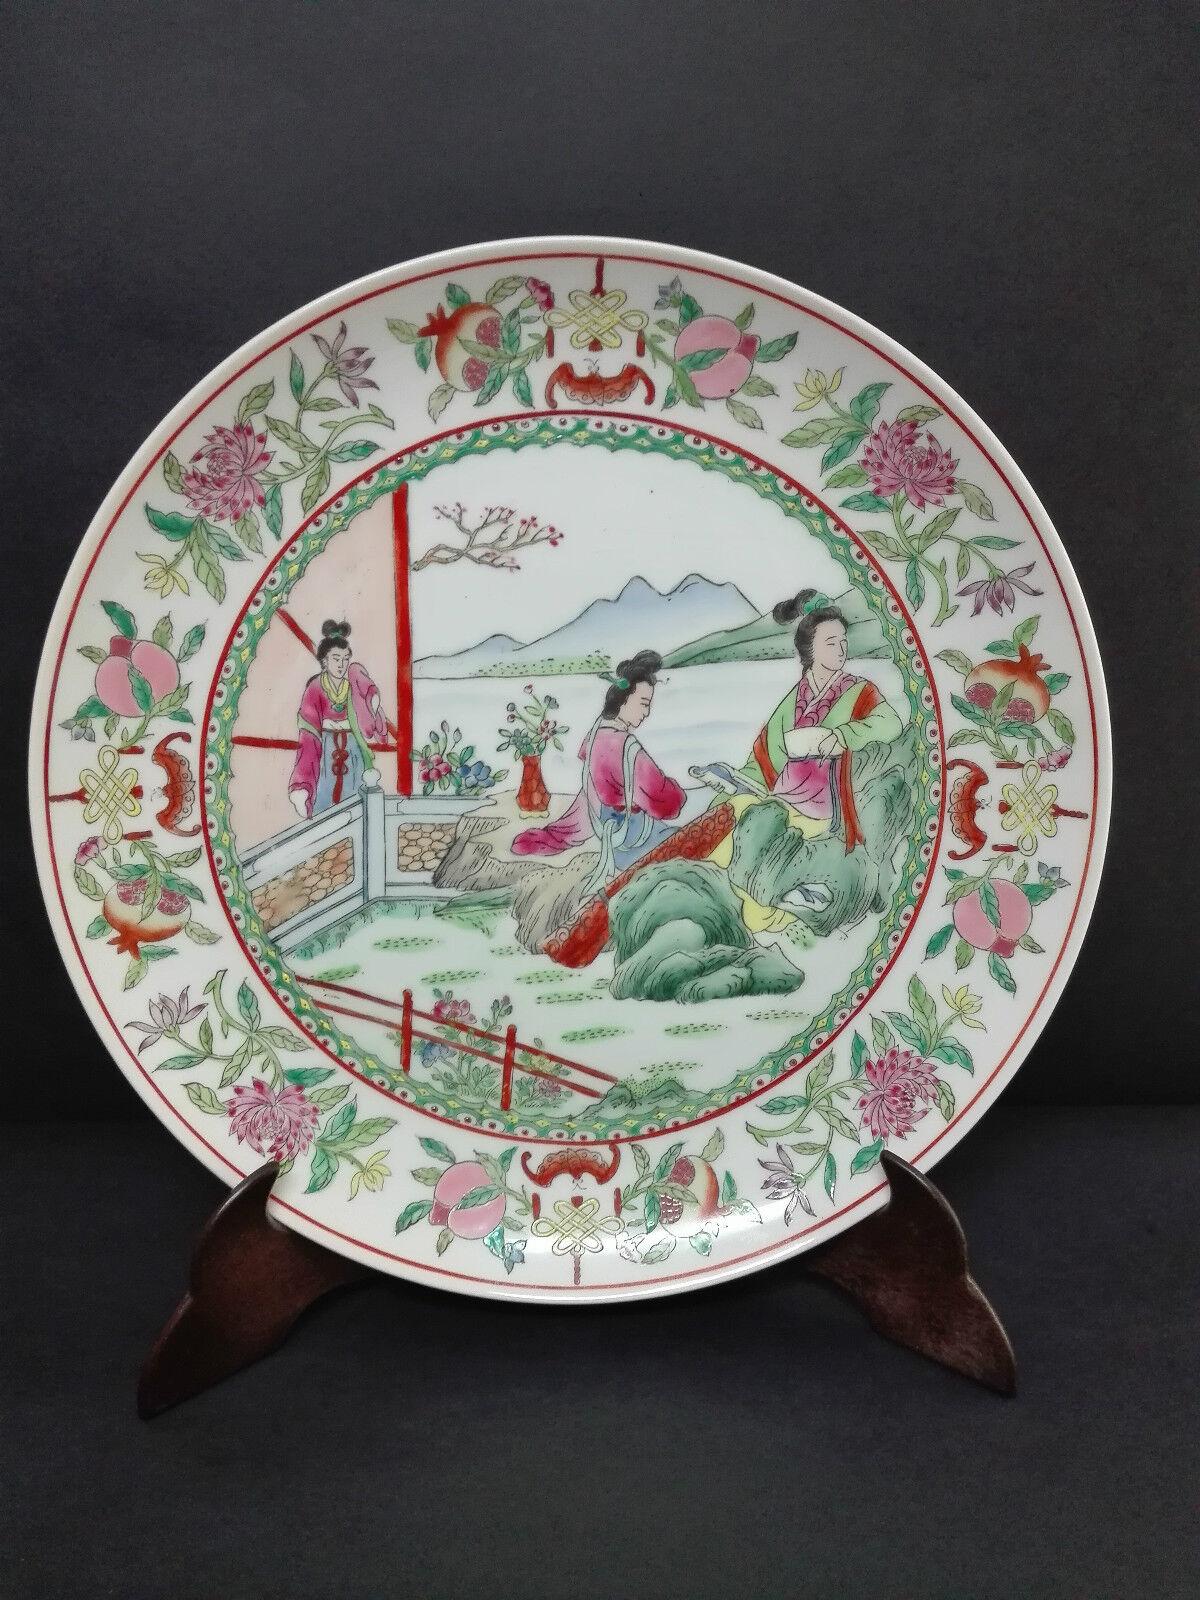 Antiguo Gran Plato en porcelana Canton china decoraciones pintadas pintadas pintadas a Femmeo 31cm. bdbdf2